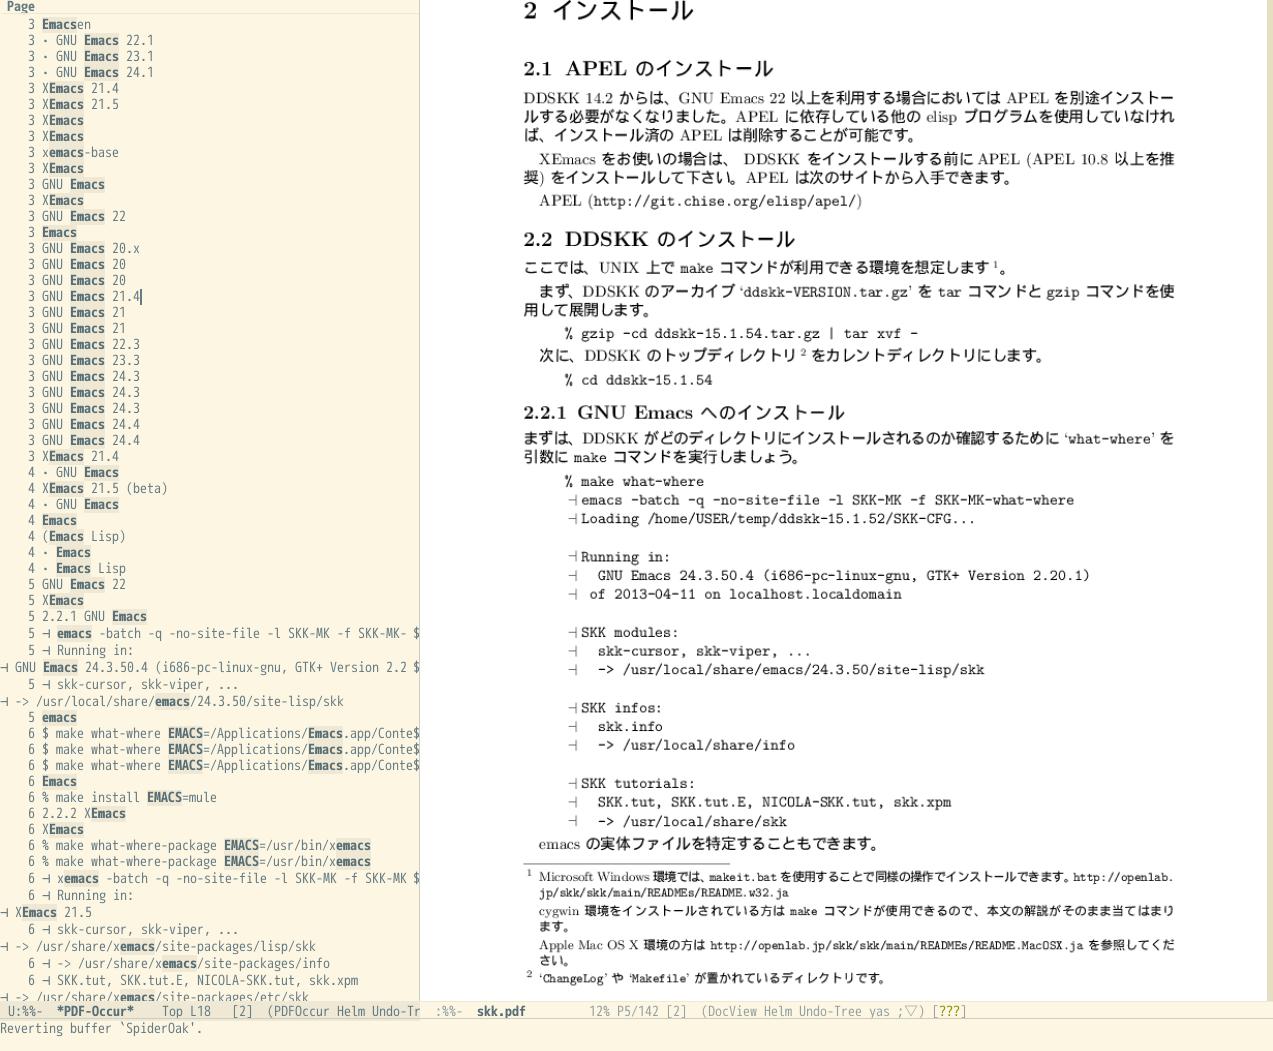 screenshot-04.png